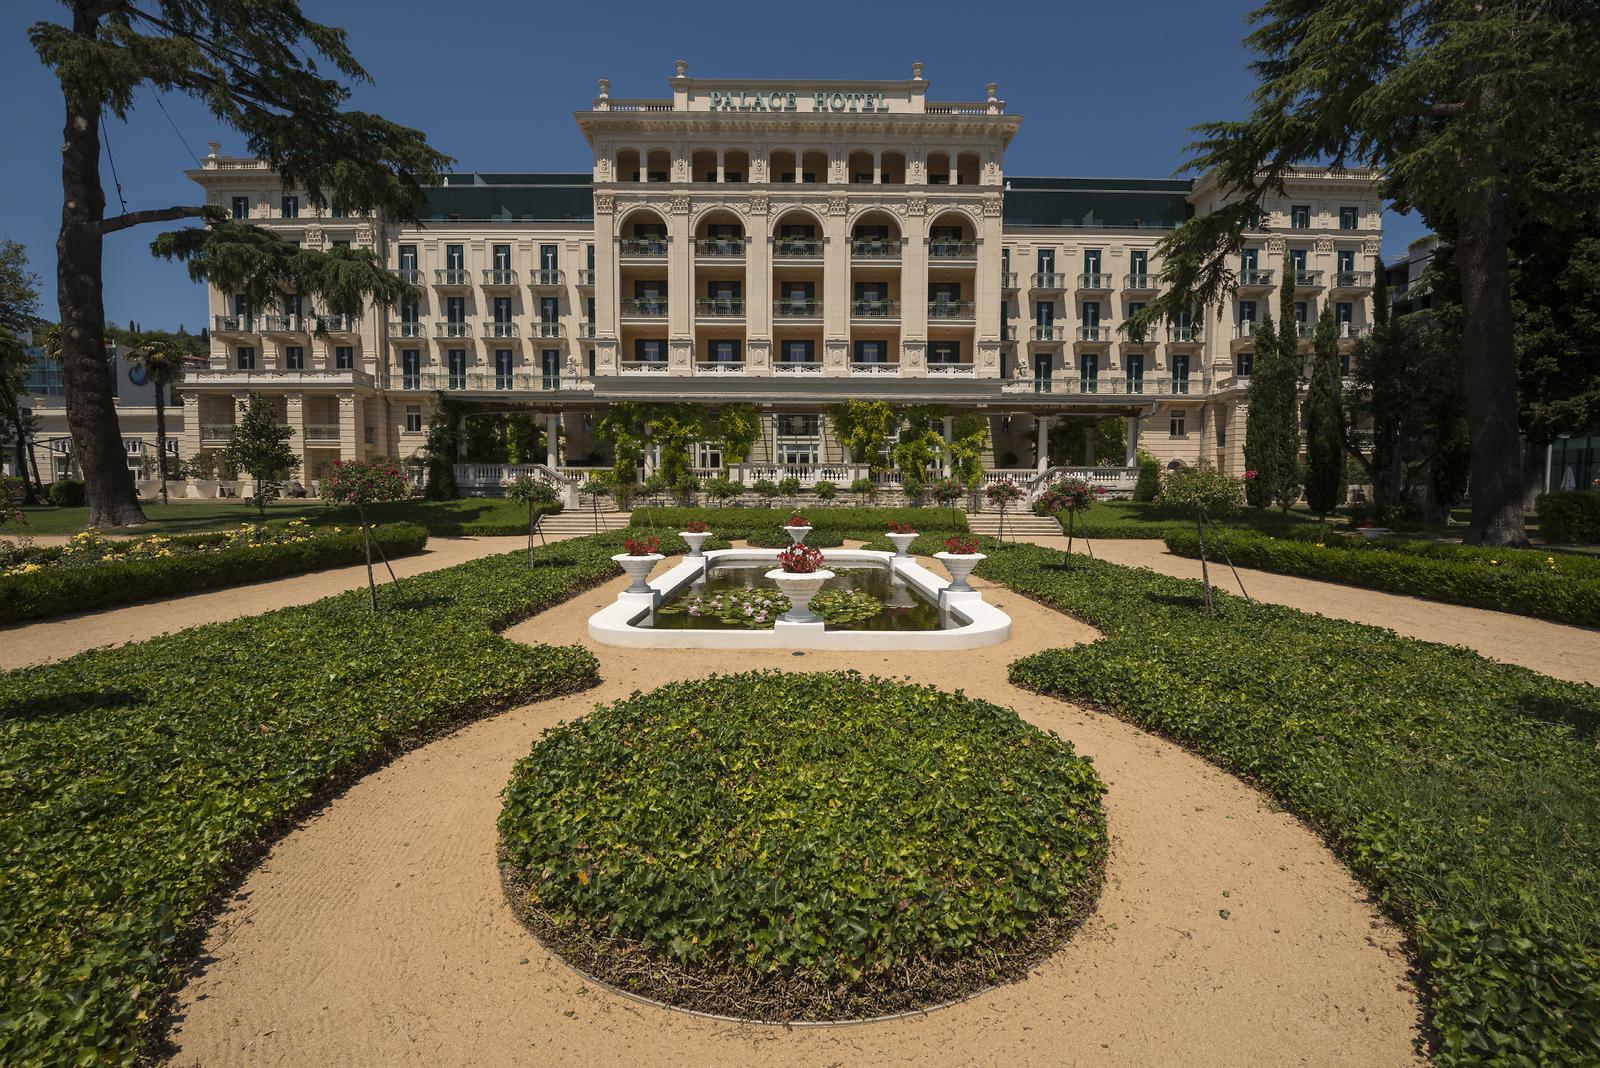 Hotel Palace Portoroz; foto: Nea Culpa - Jure Kravanja; vir: www.slovenia.info